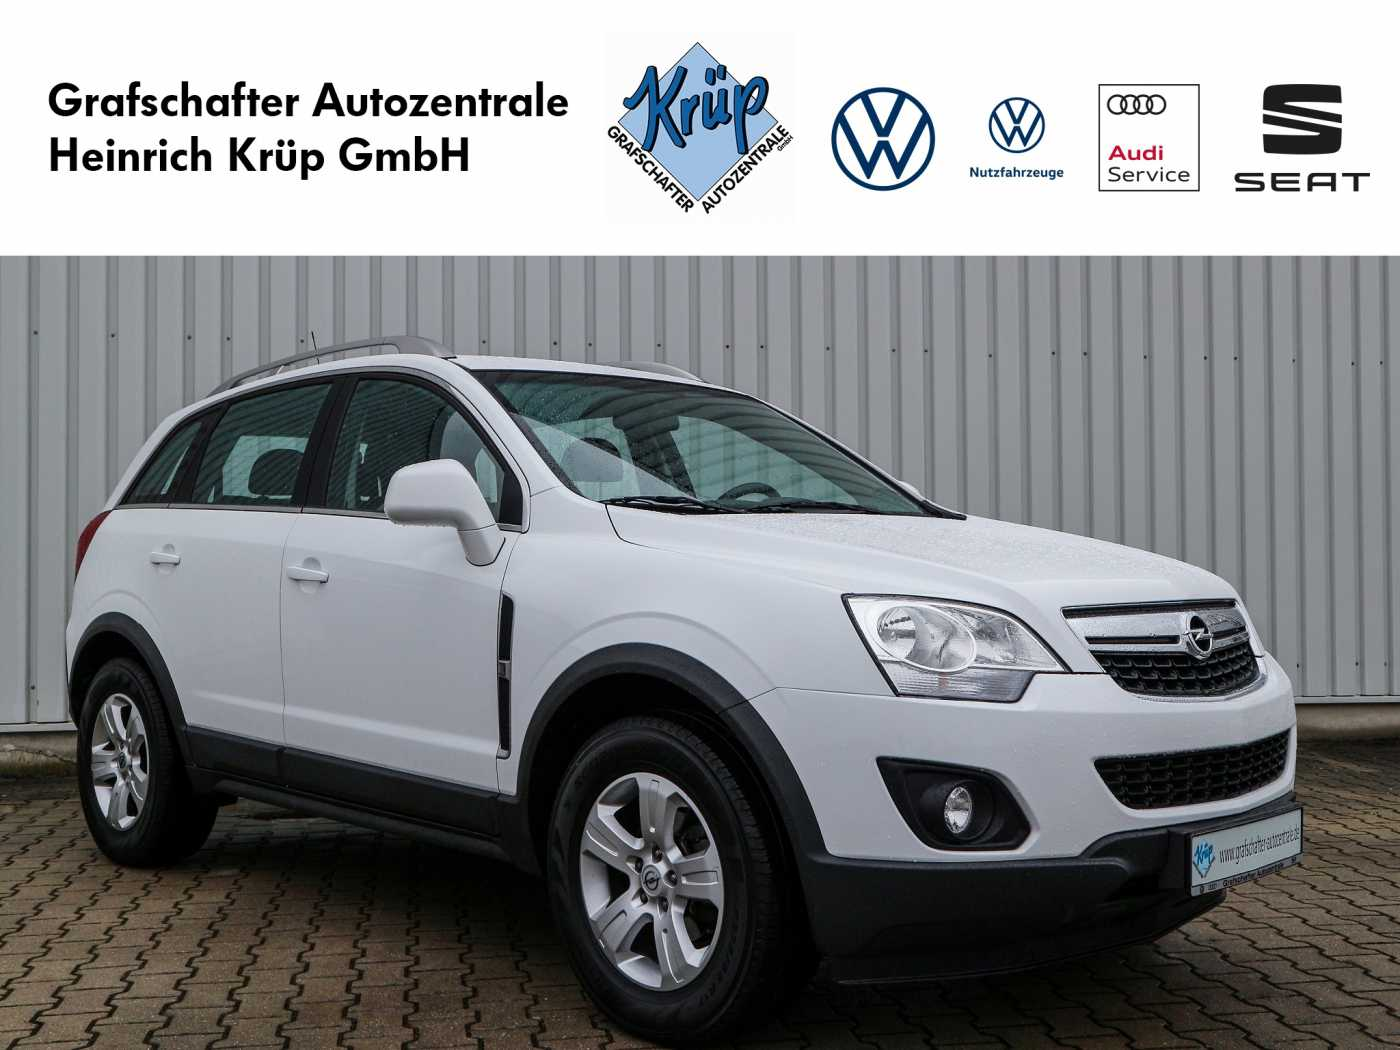 Opel Antara 2.2 CDTI ecoFLEX Start/Stop Selection, Jahr 2014, Diesel